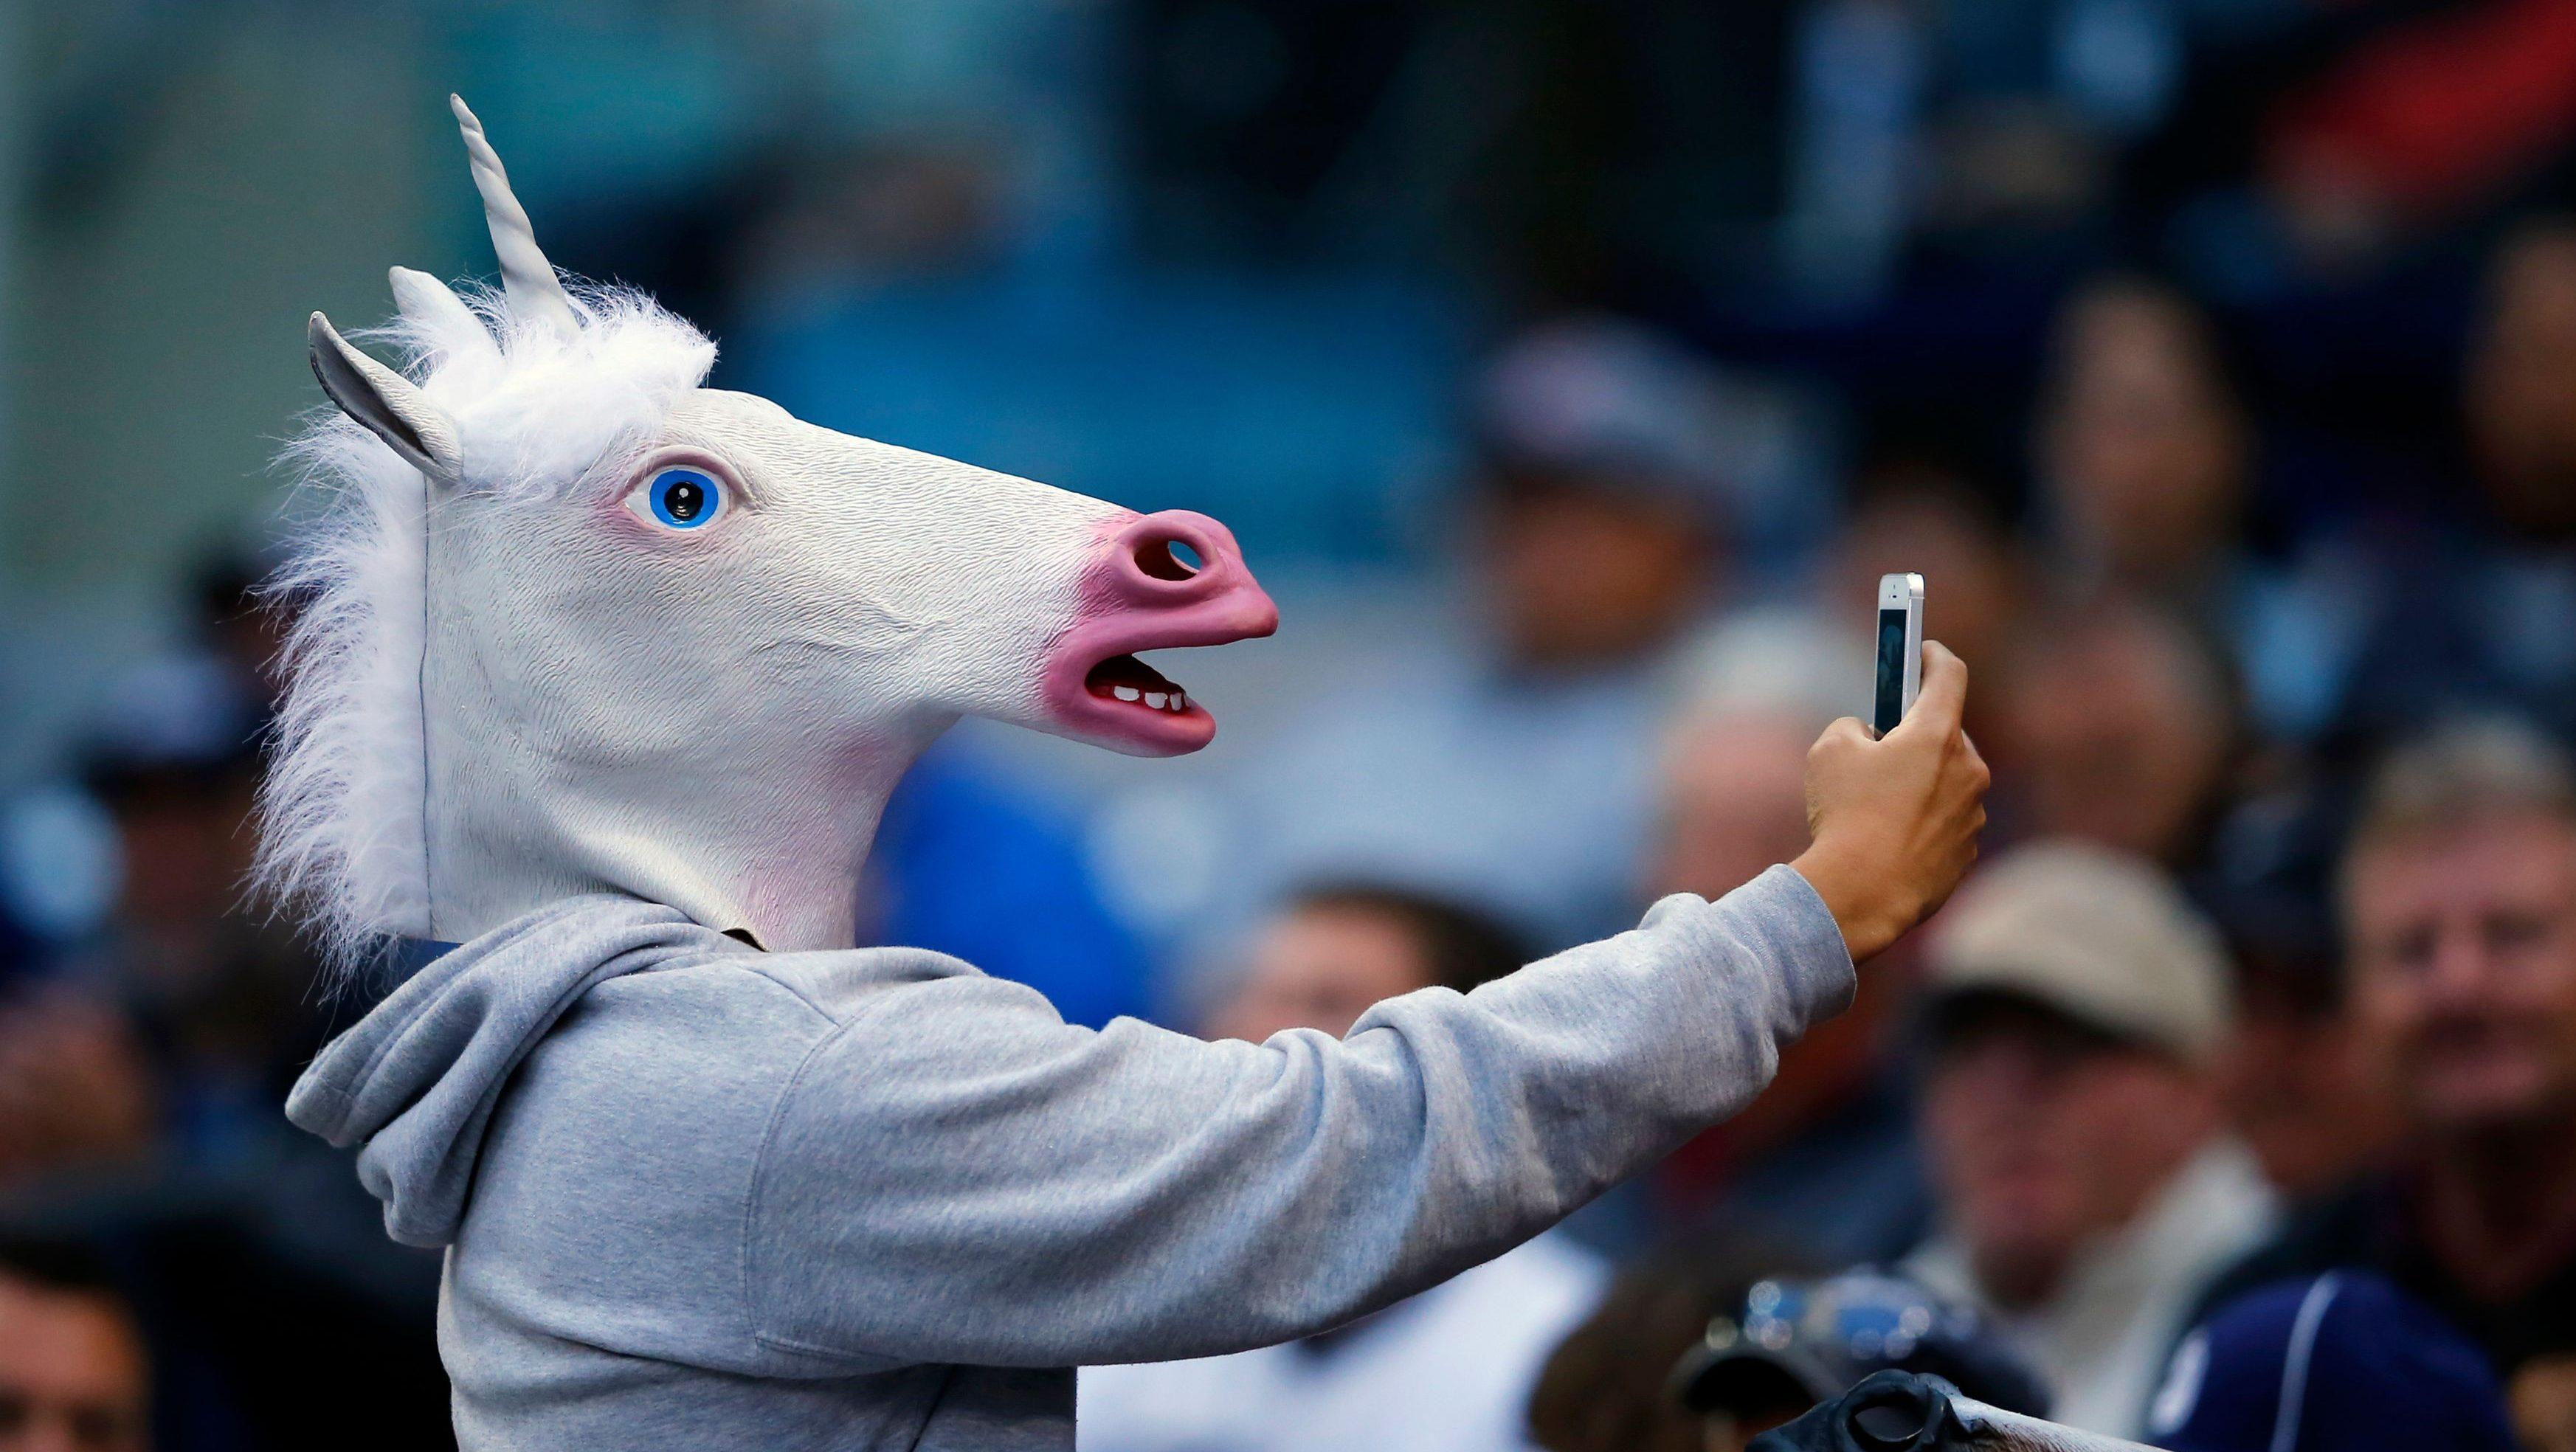 unicorn-founder-CEO-startup